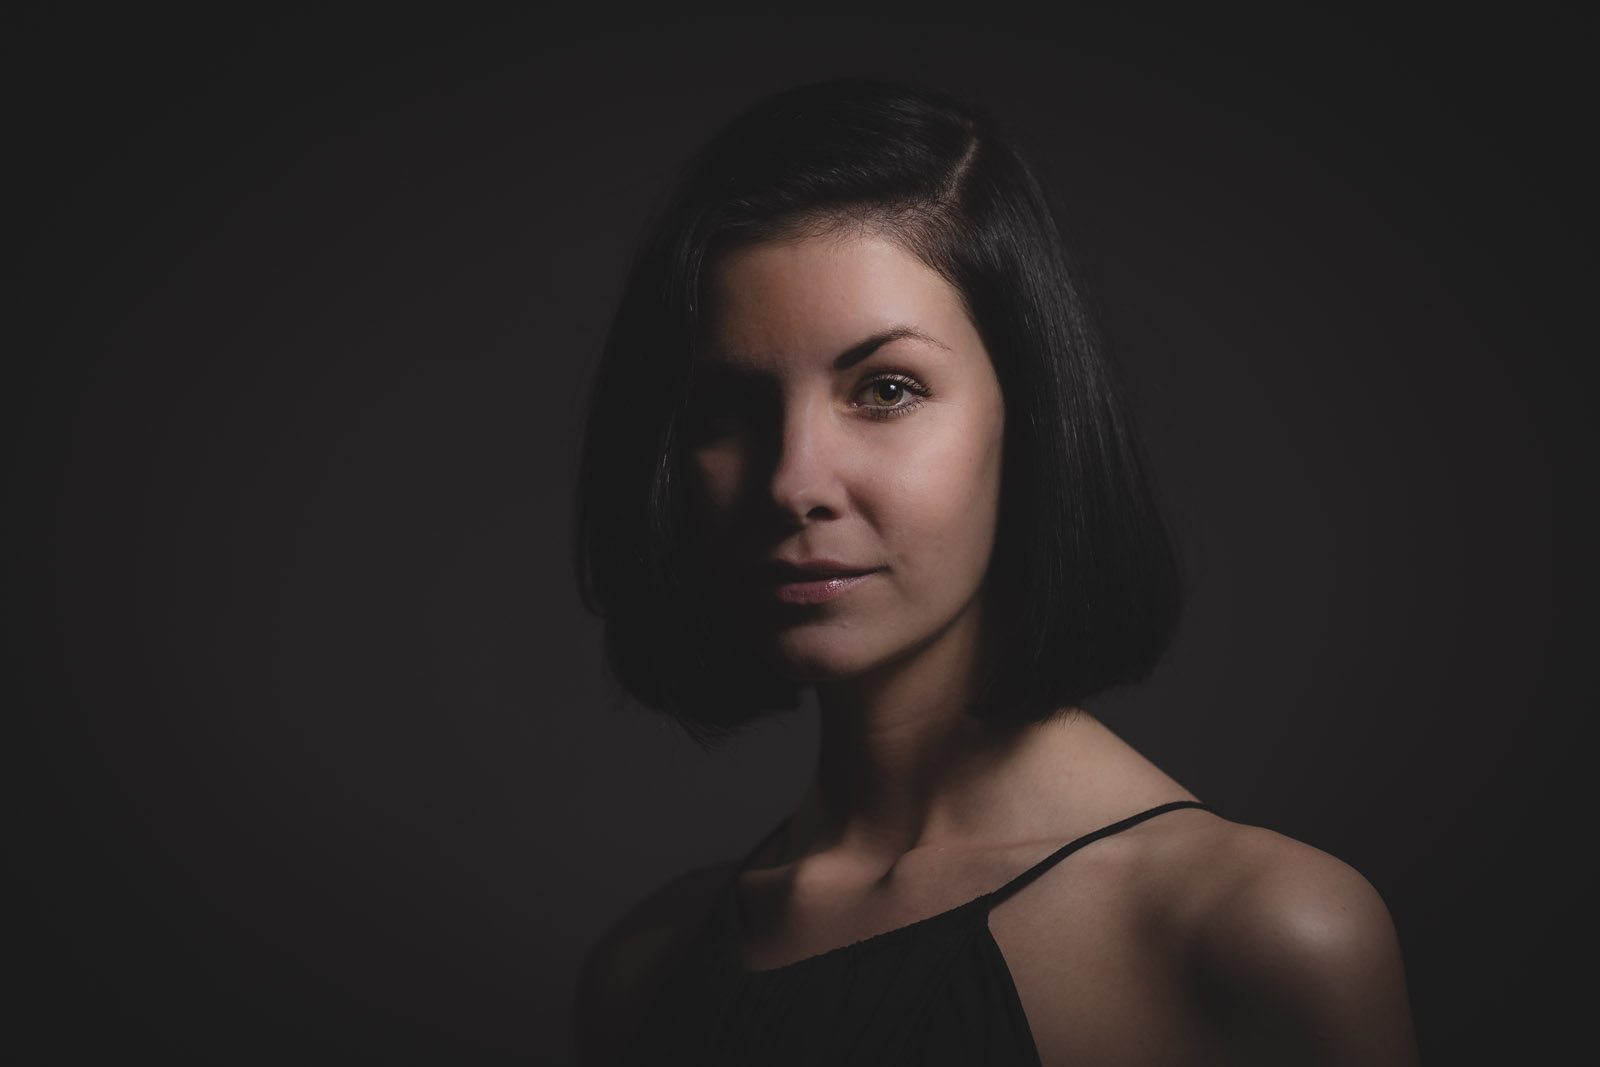 portrait, portraitphotographer, studio, porträtt, porträttfotograf, caroline lindner